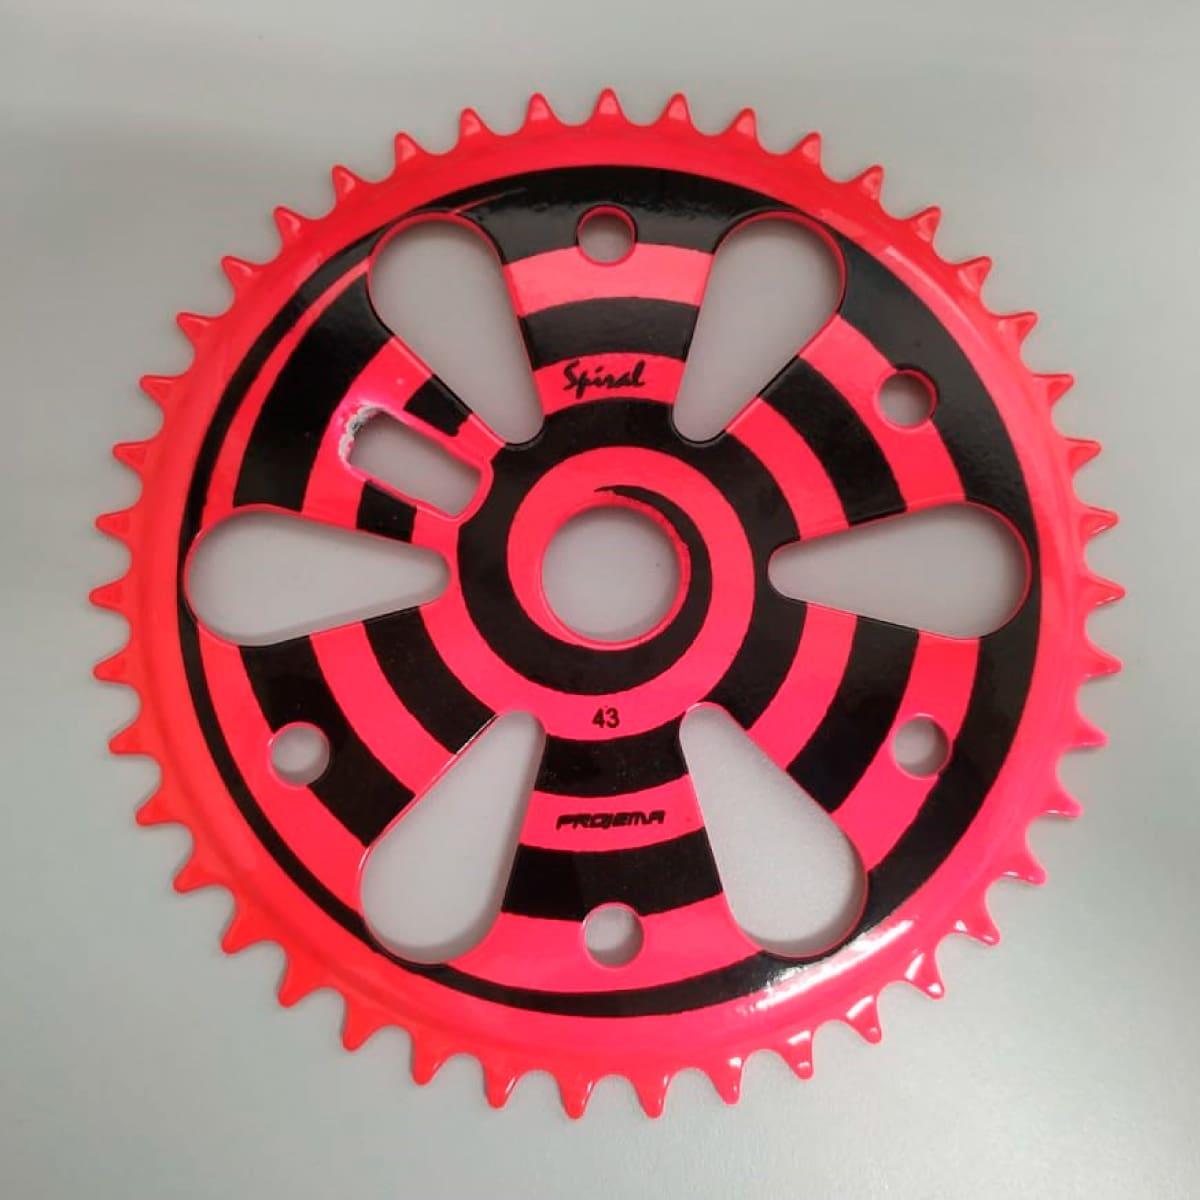 Coroa Projema 43D Spiral Pink Neon